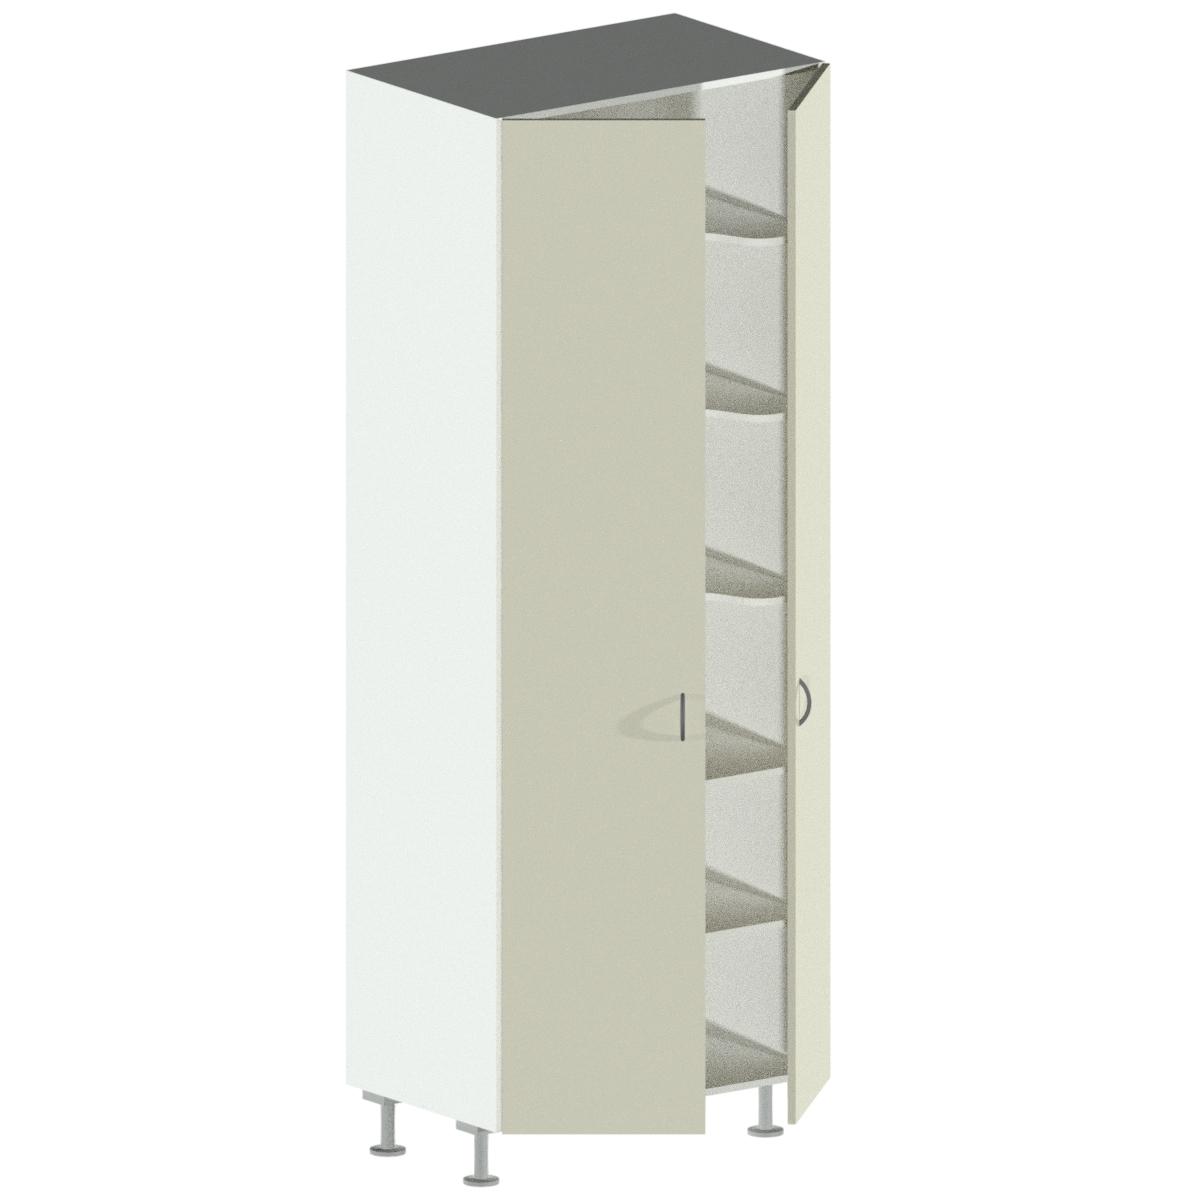 2 Door Pantry Cnc Cabinets